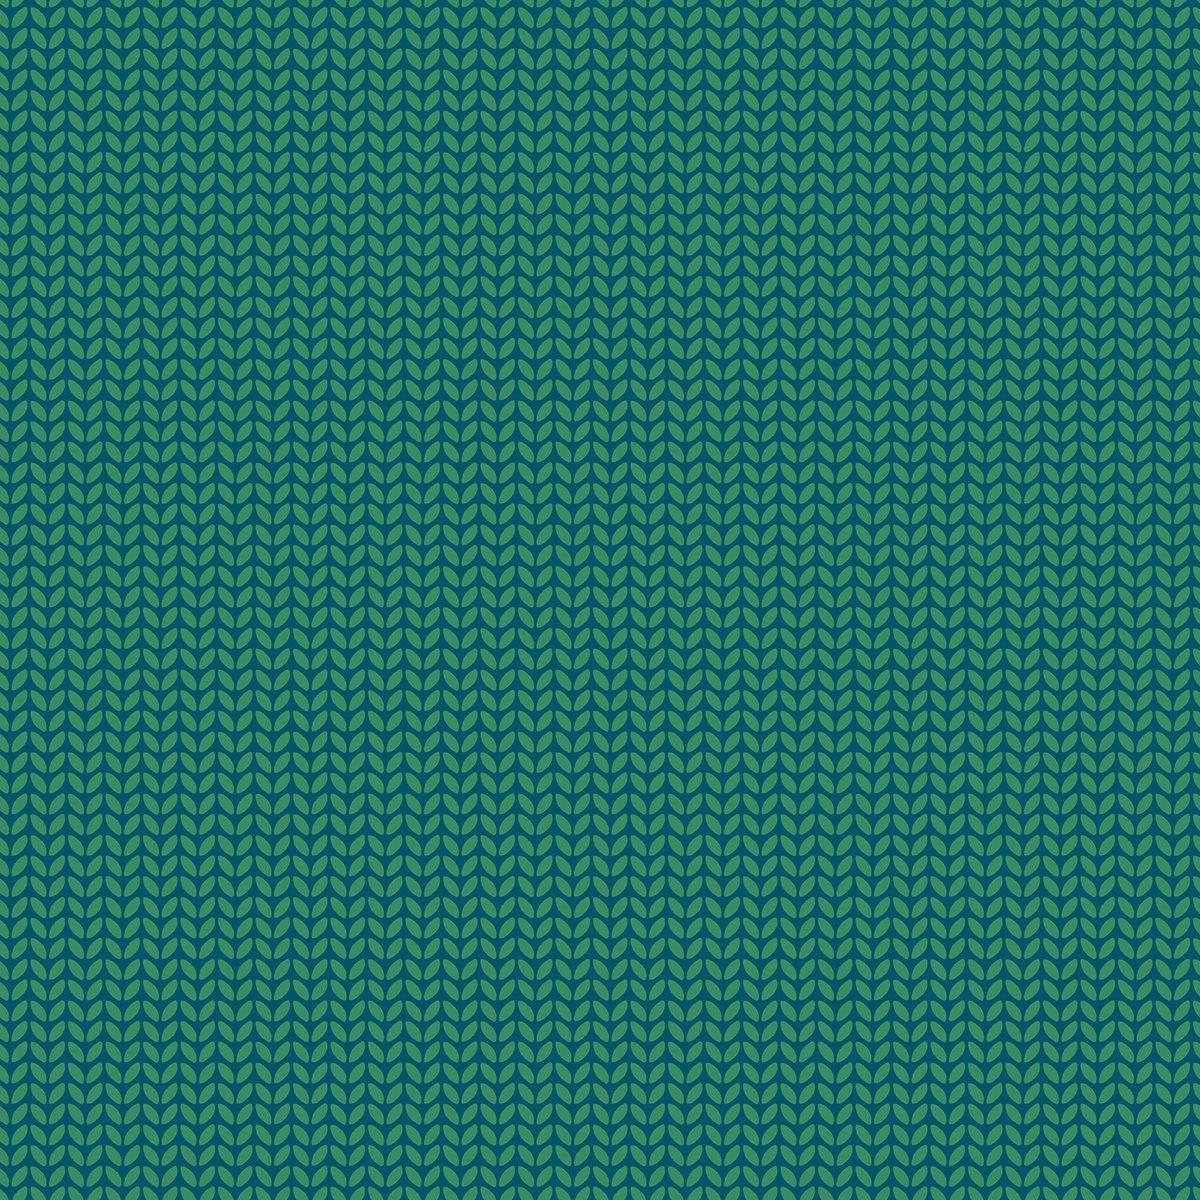 Purl Knit in Emerald